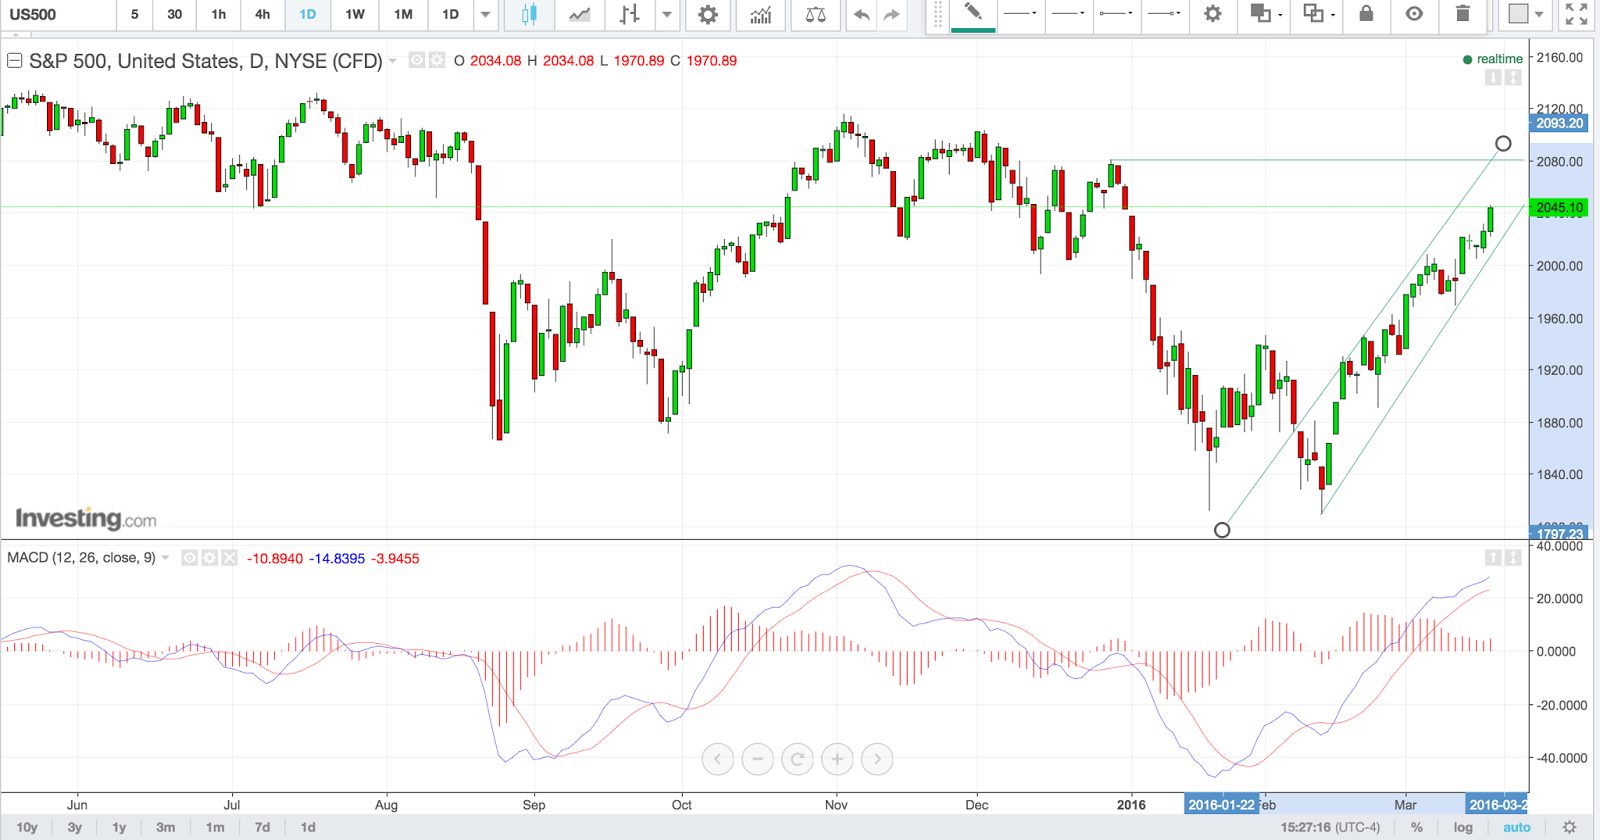 S&P 500 Futures - Jun 16